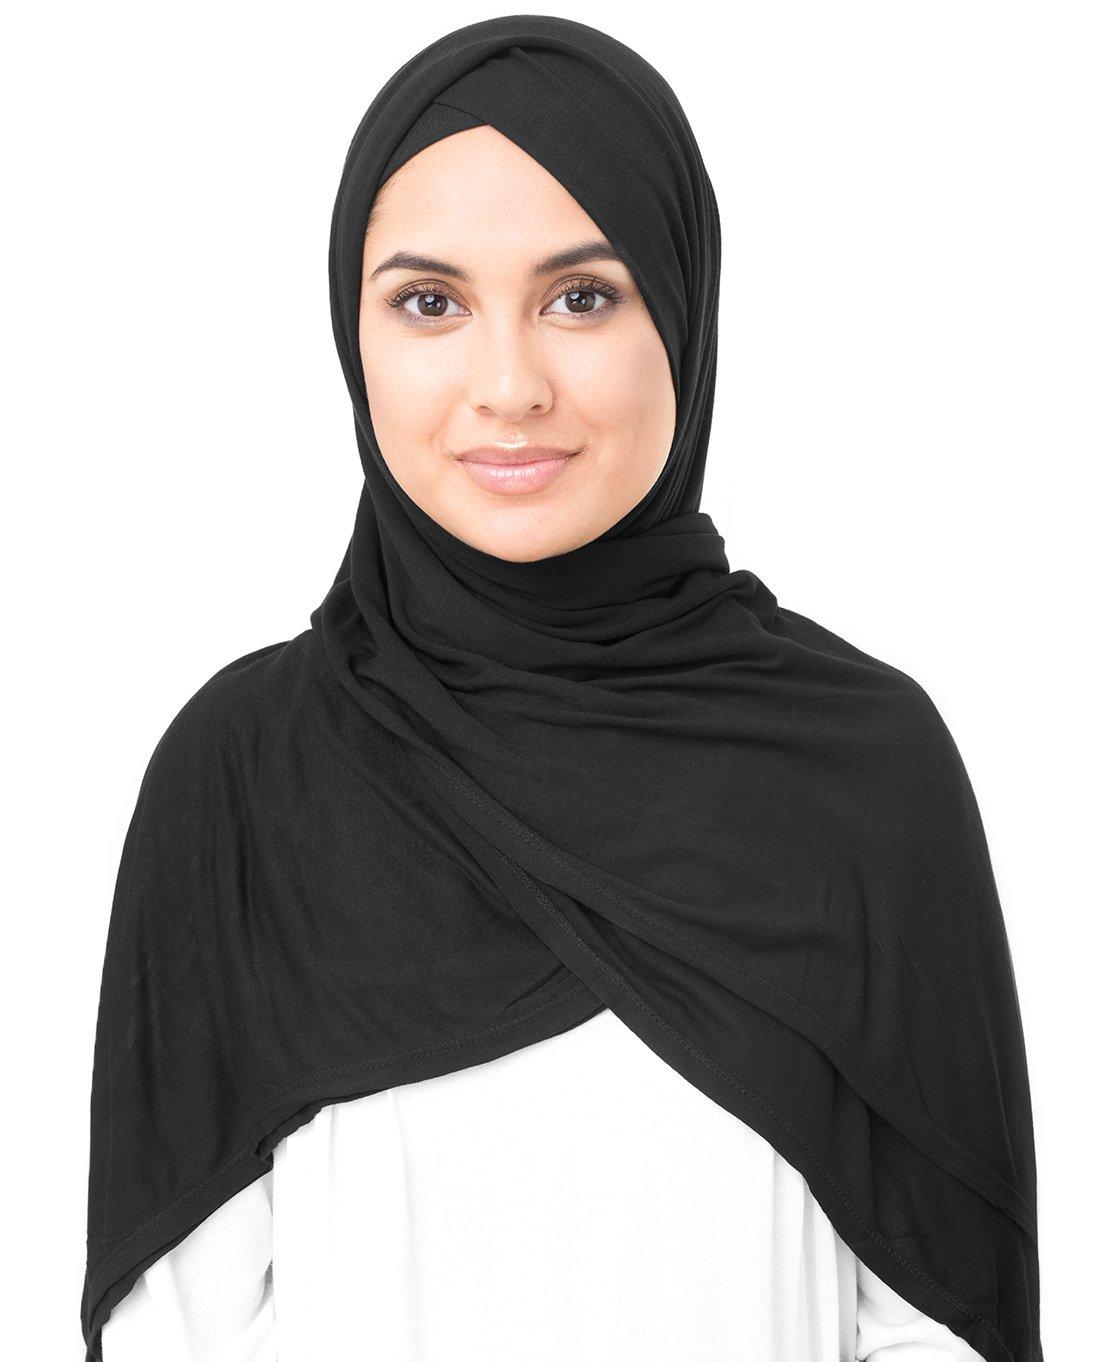 InEssence Jet Black Viscose Jersey Scarf Women Girls Wrap Medium Size Hijab